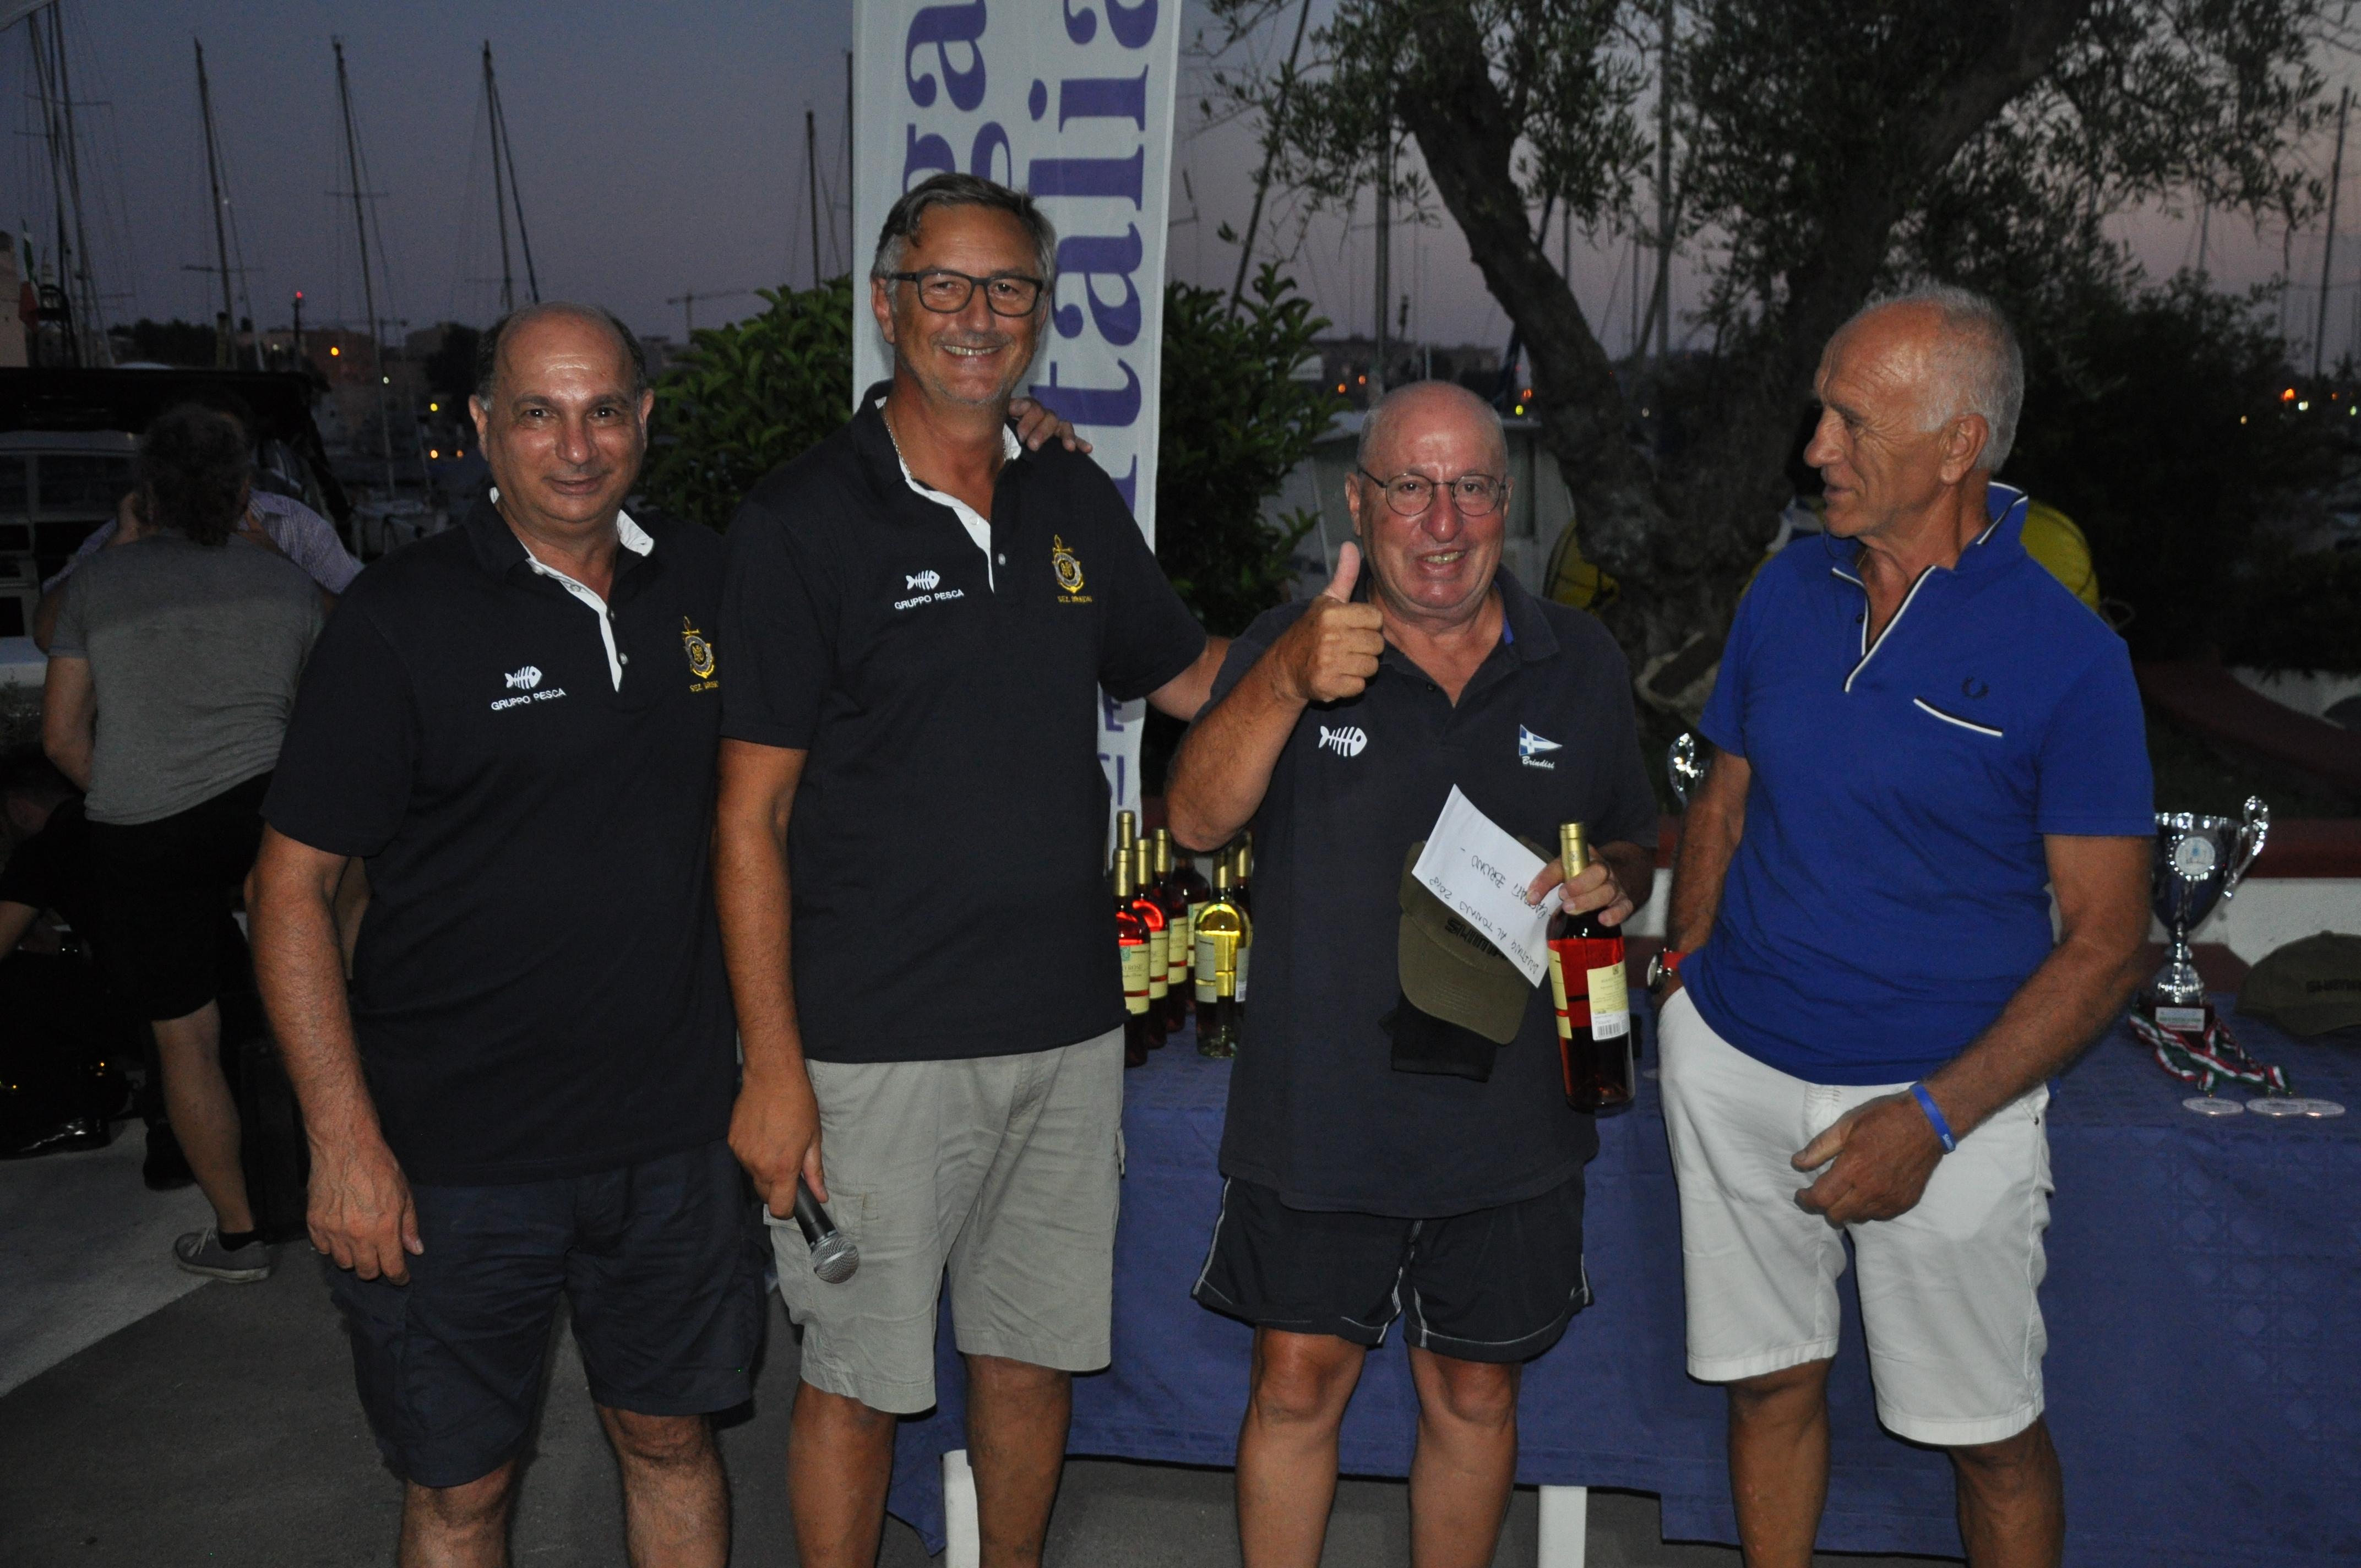 premiazione drifting al tonno 2018 (15)